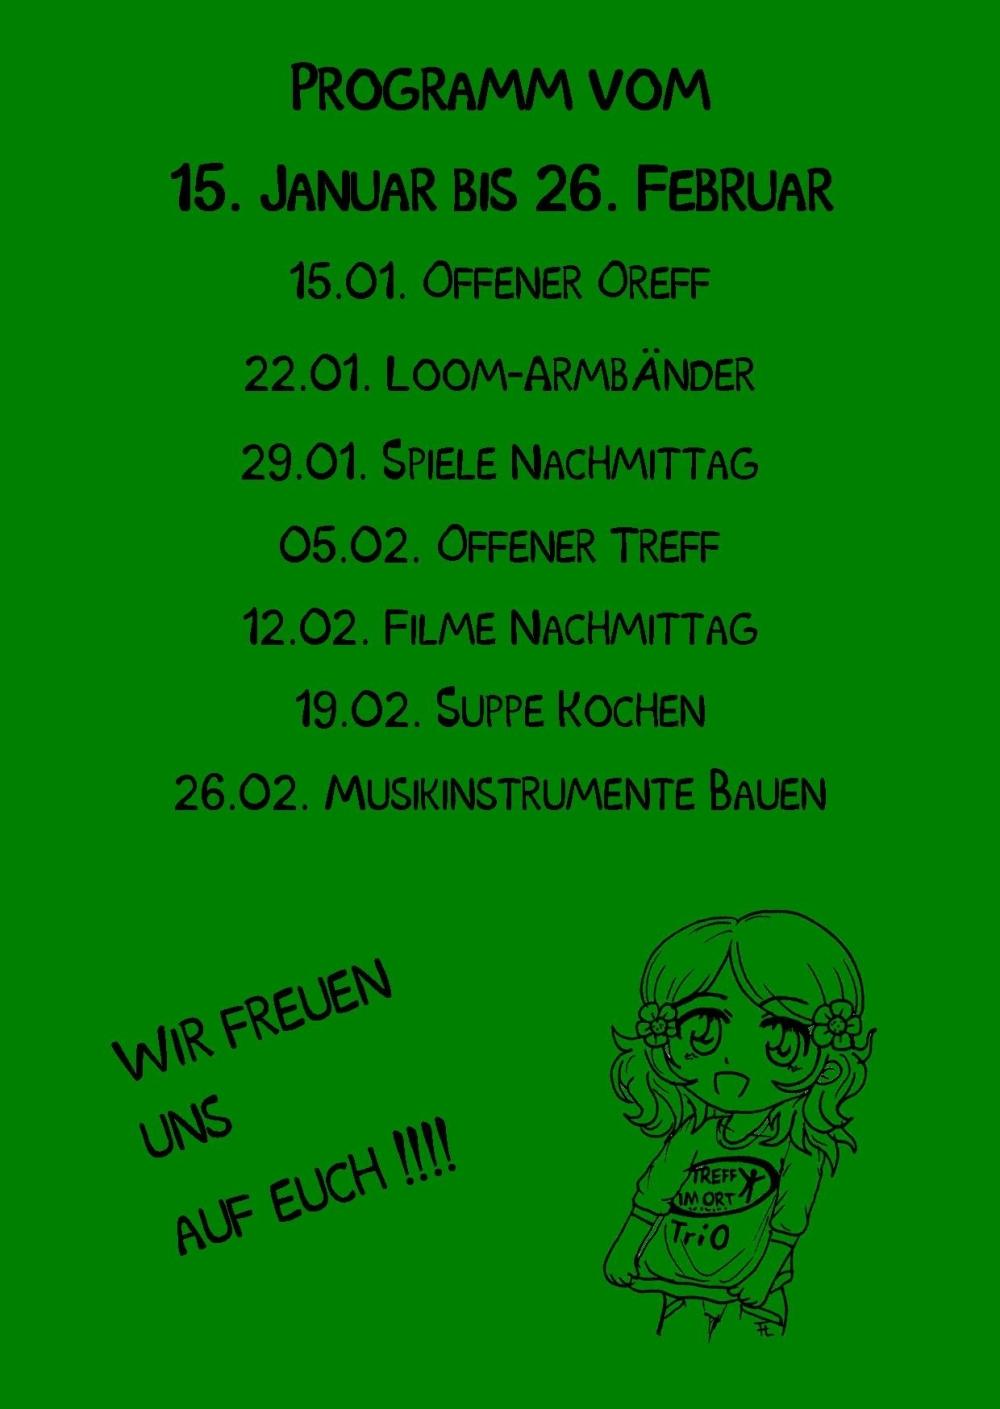 Mädchentag TriO rück Publisher 01.01.2015 grün